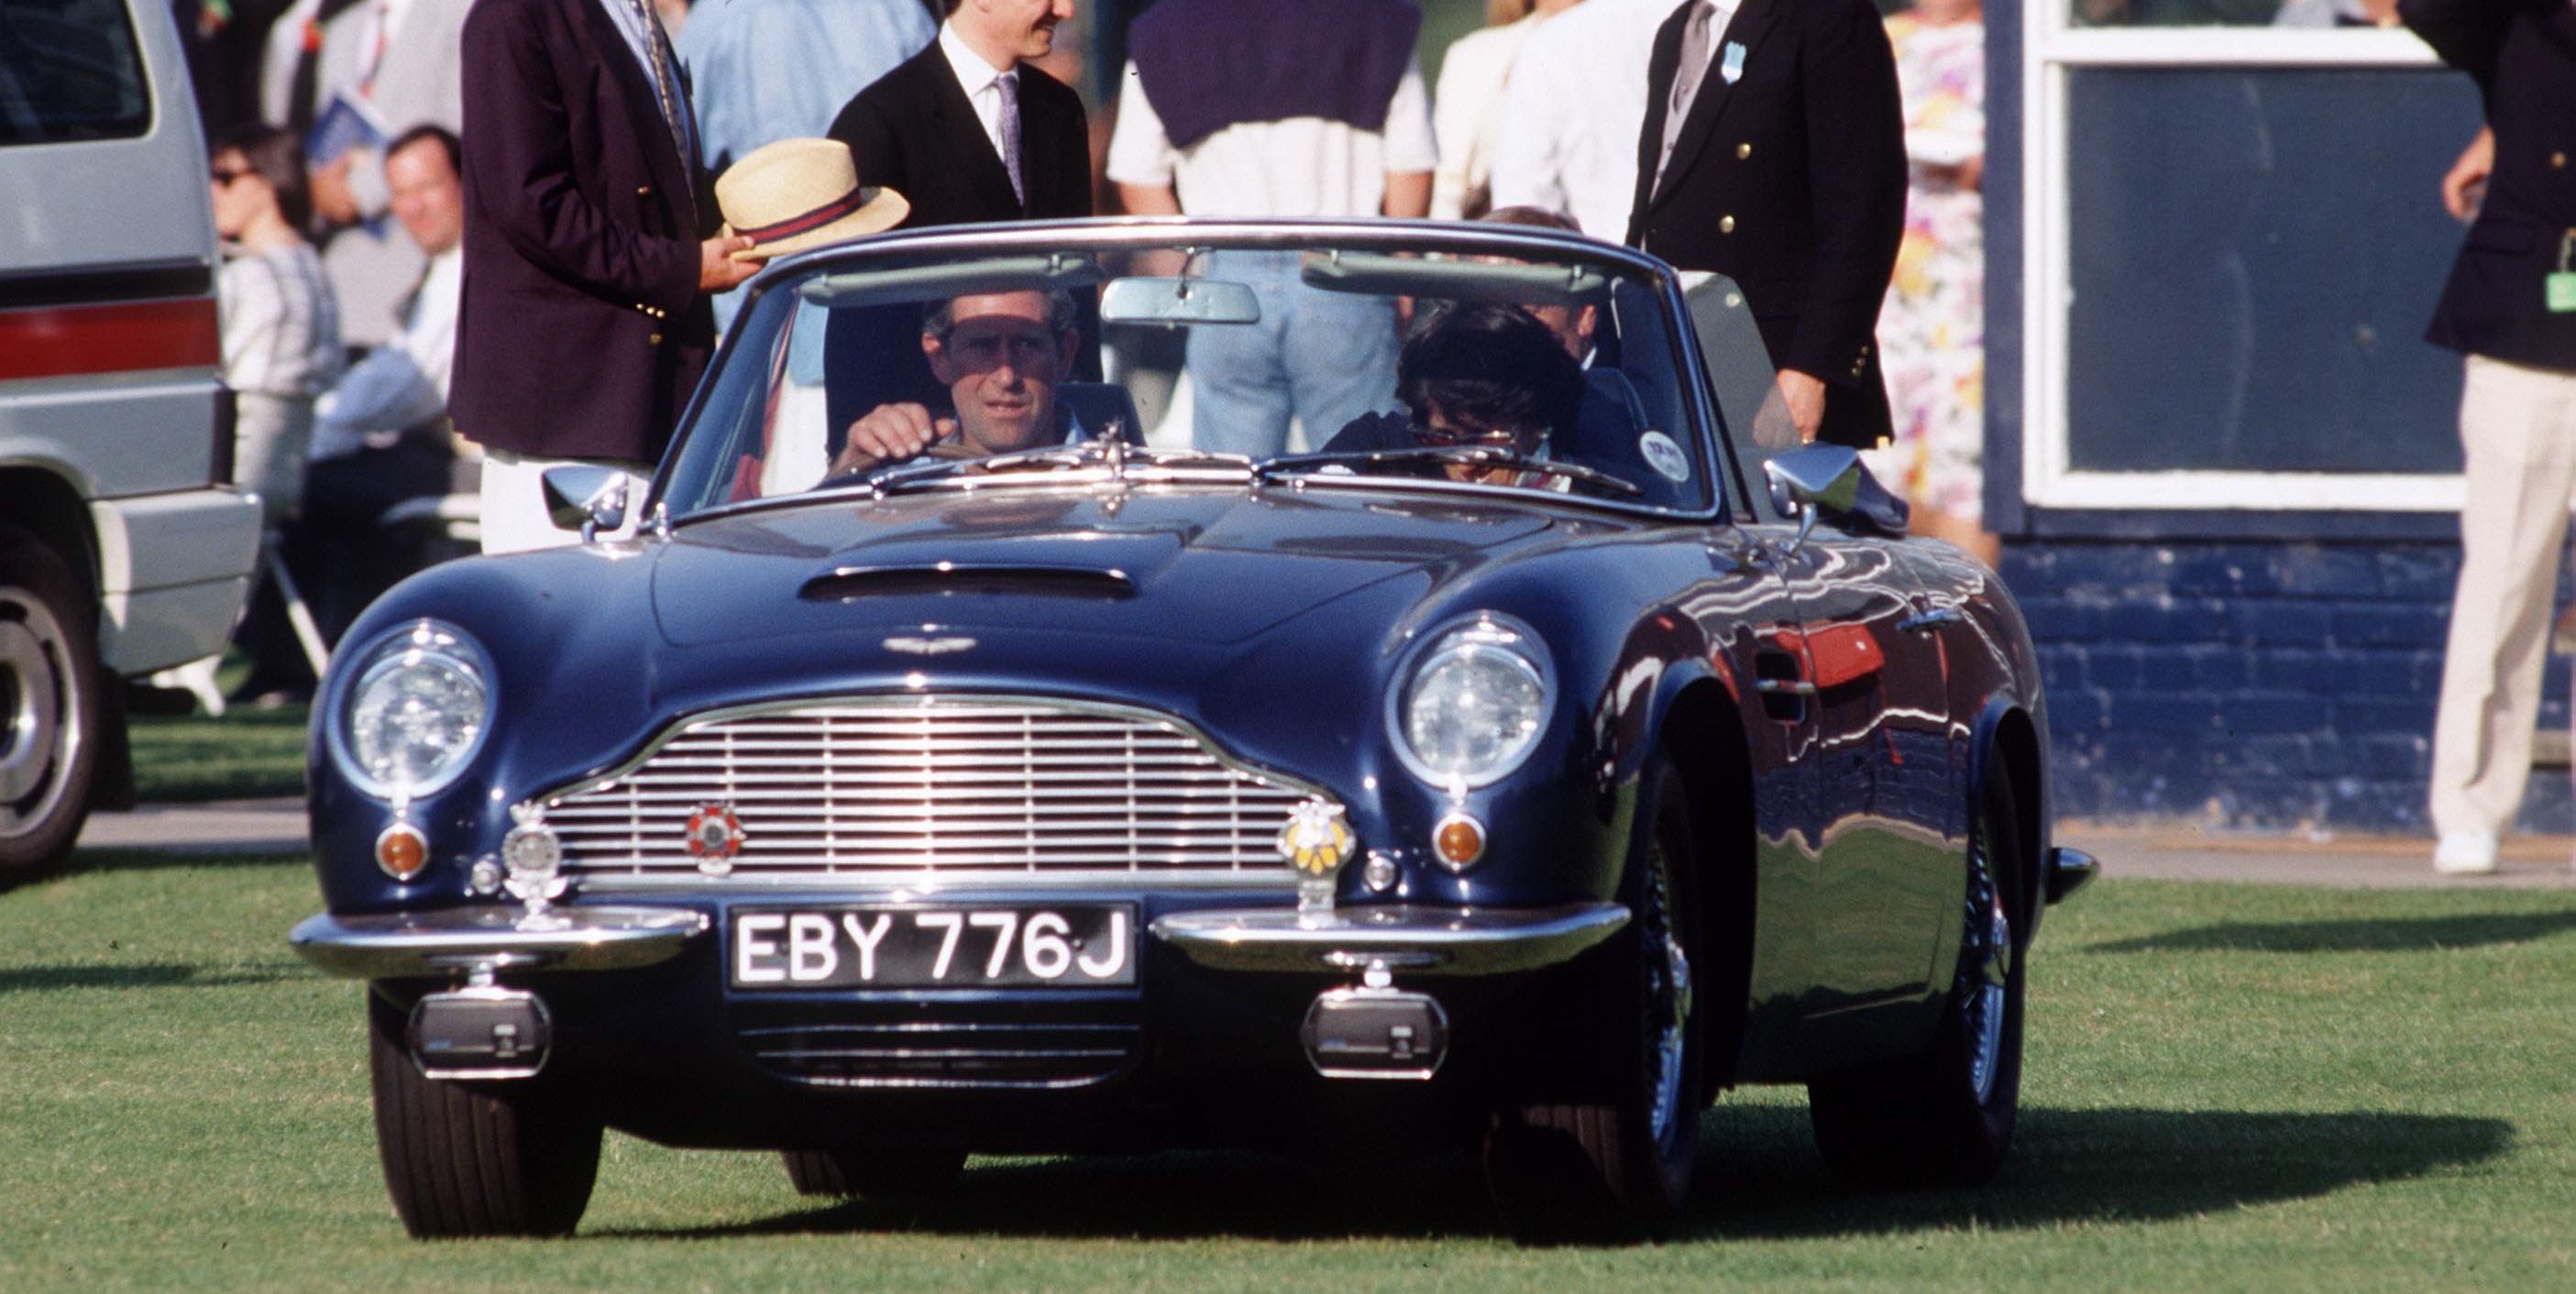 Charles Aston Martin Car